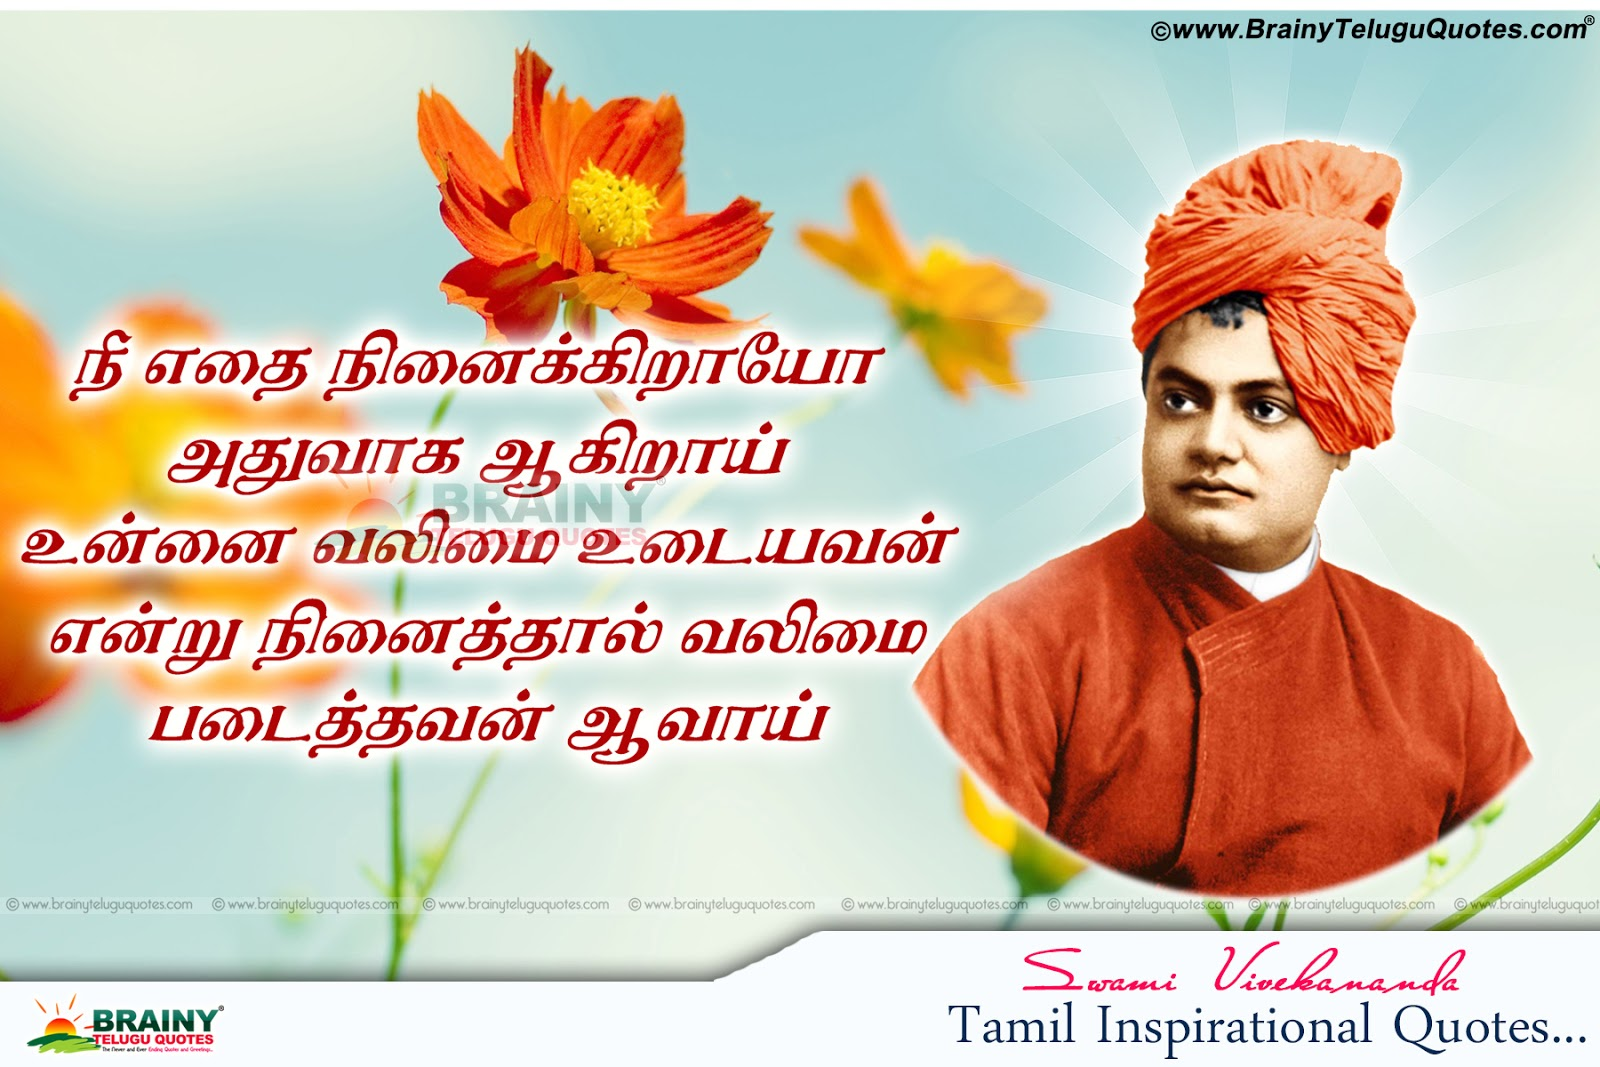 Swami Vivekananda Quotes Wallpapers In Kannada Swami Vivekananda Daily Motivated Golden Words In Tamil